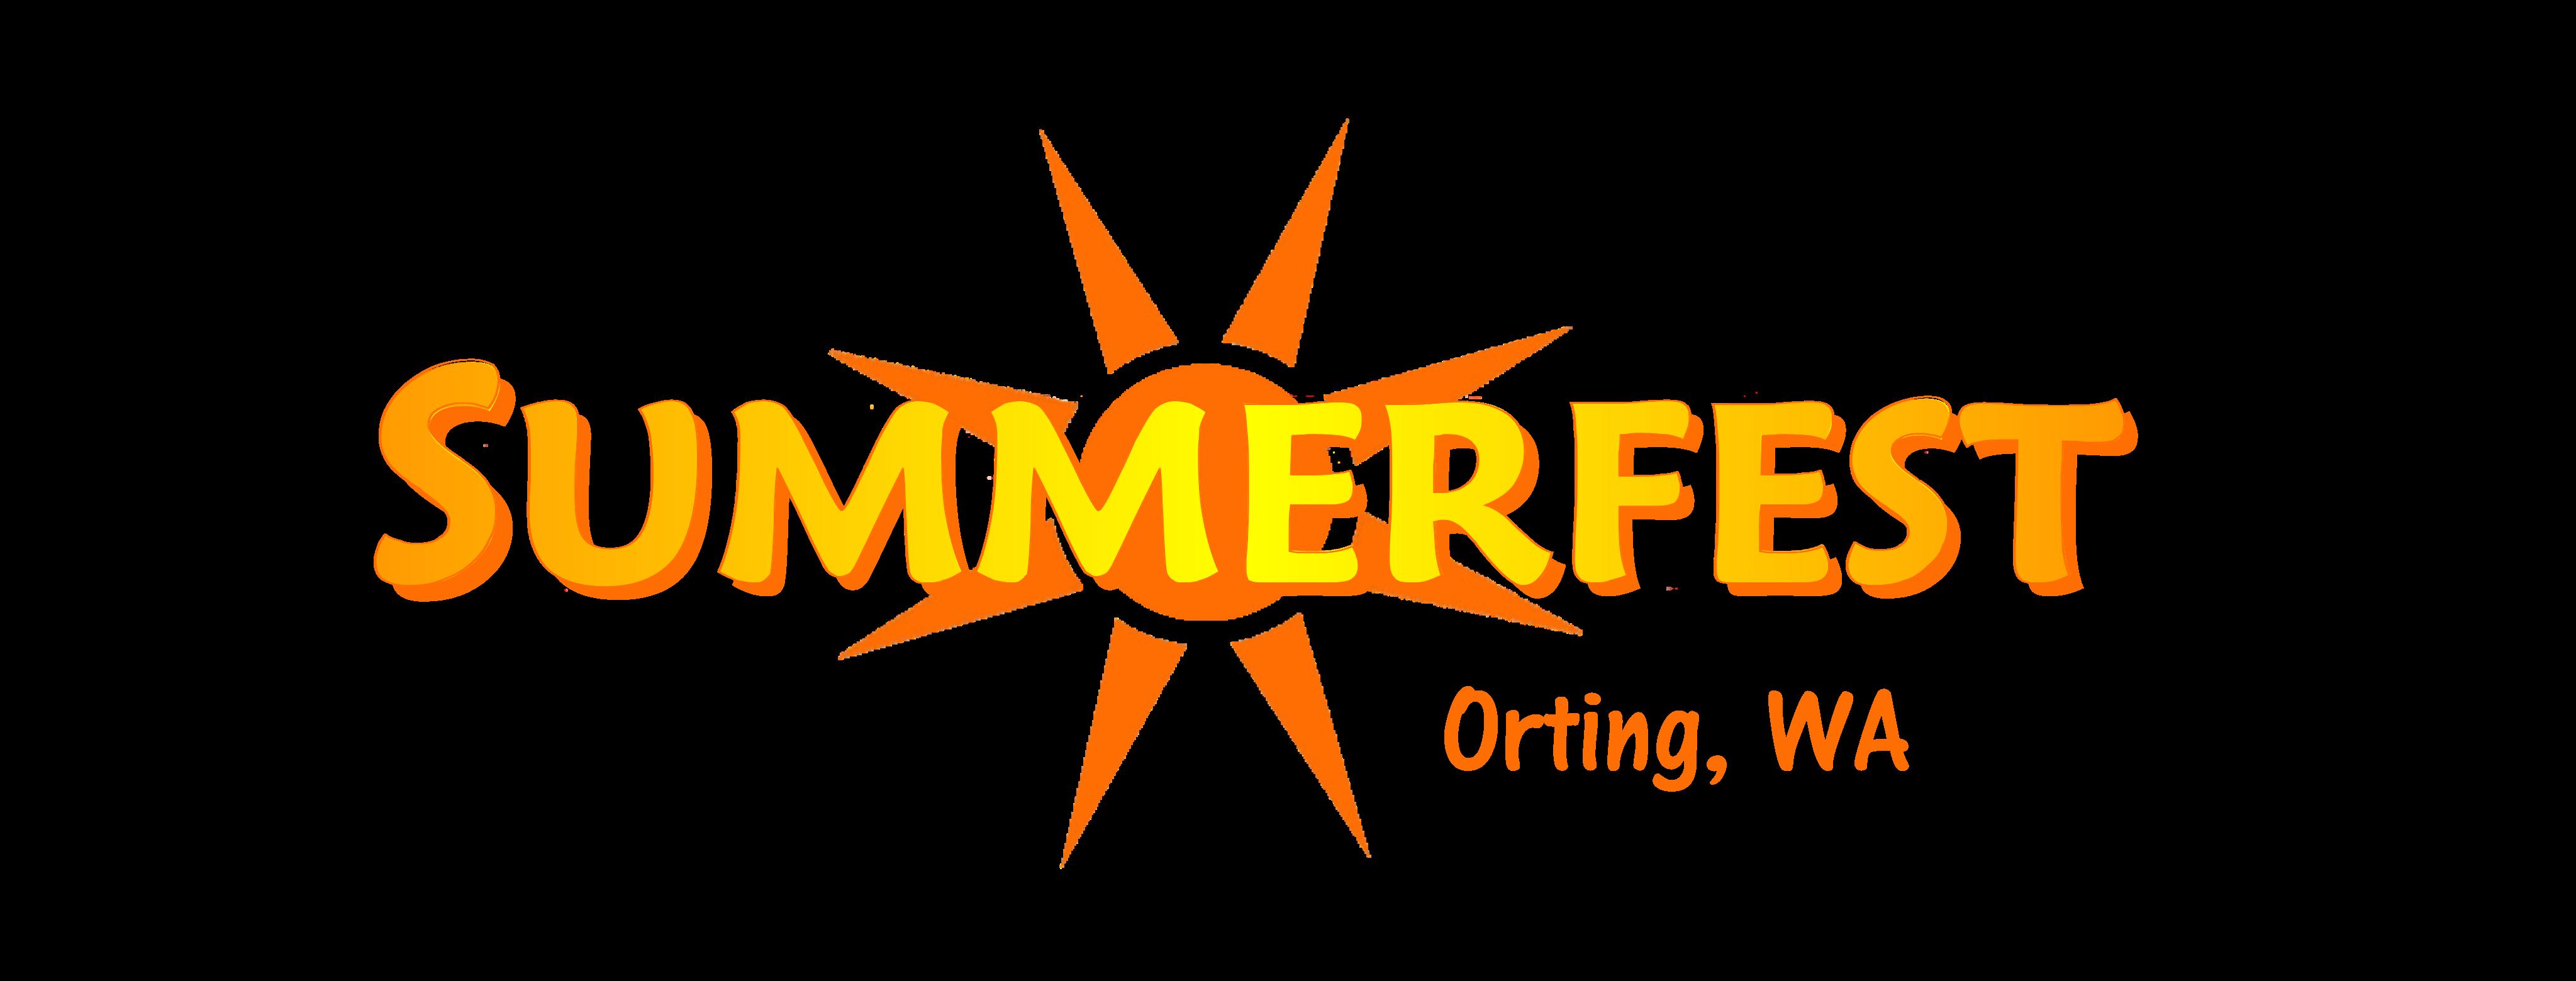 New summerfest logo